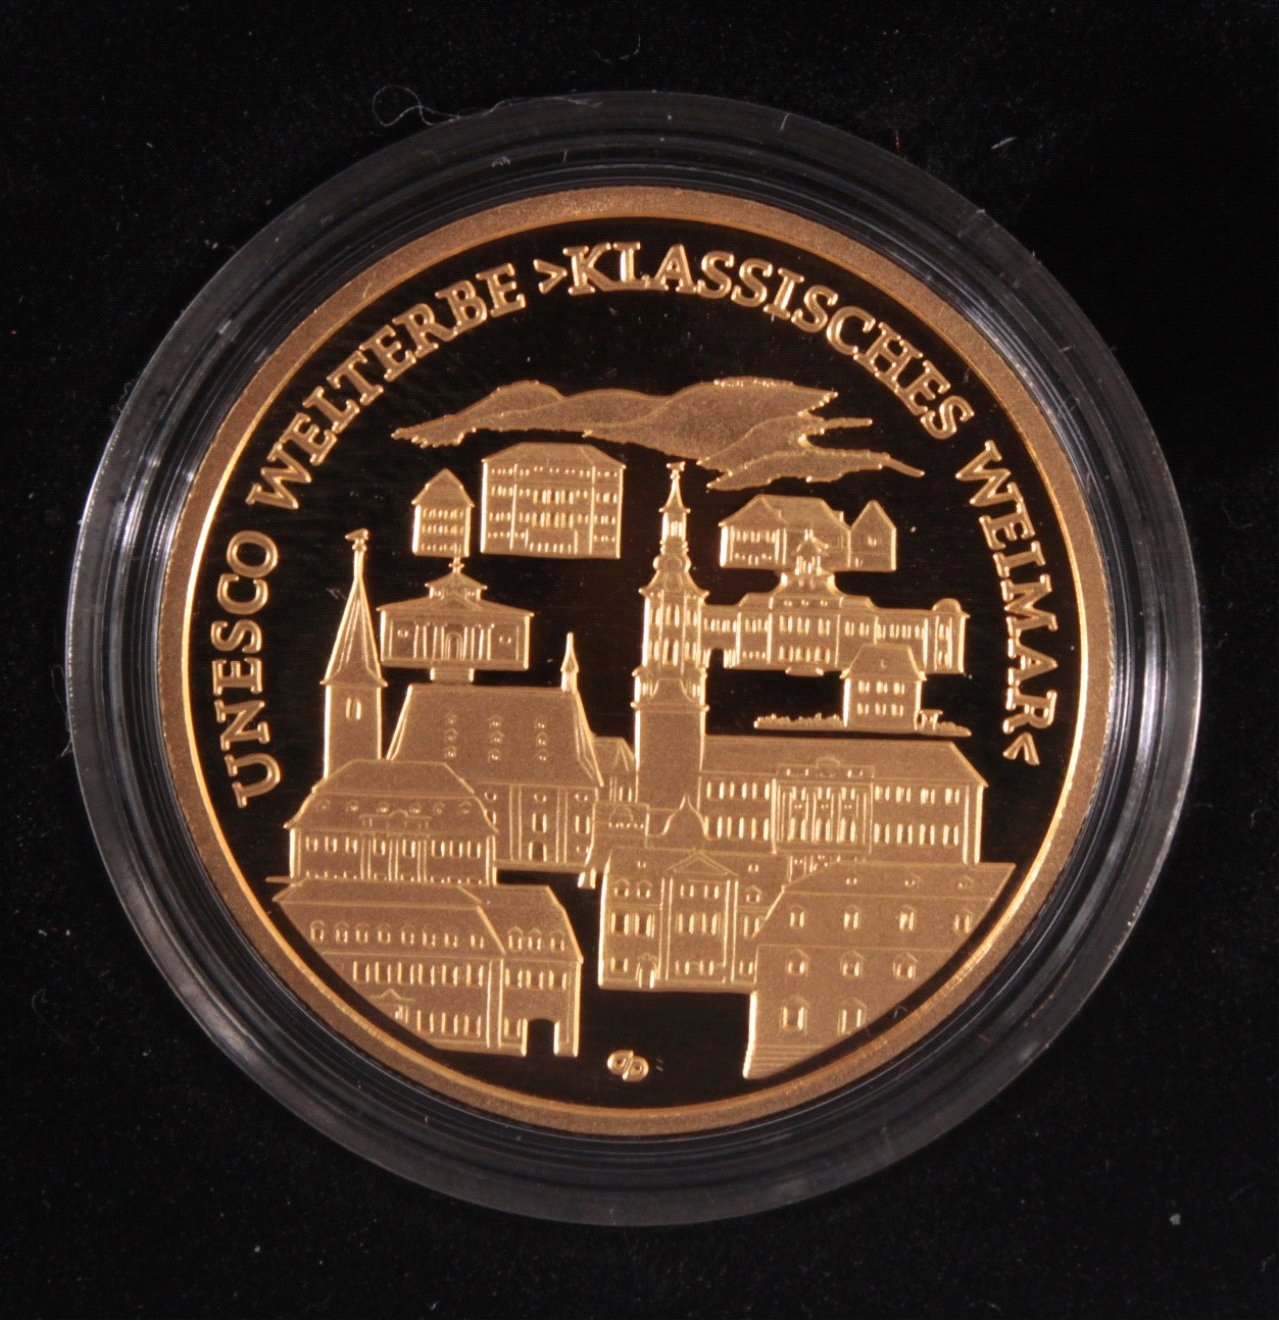 Goldmünze 100 Euro Klasisches Weimar